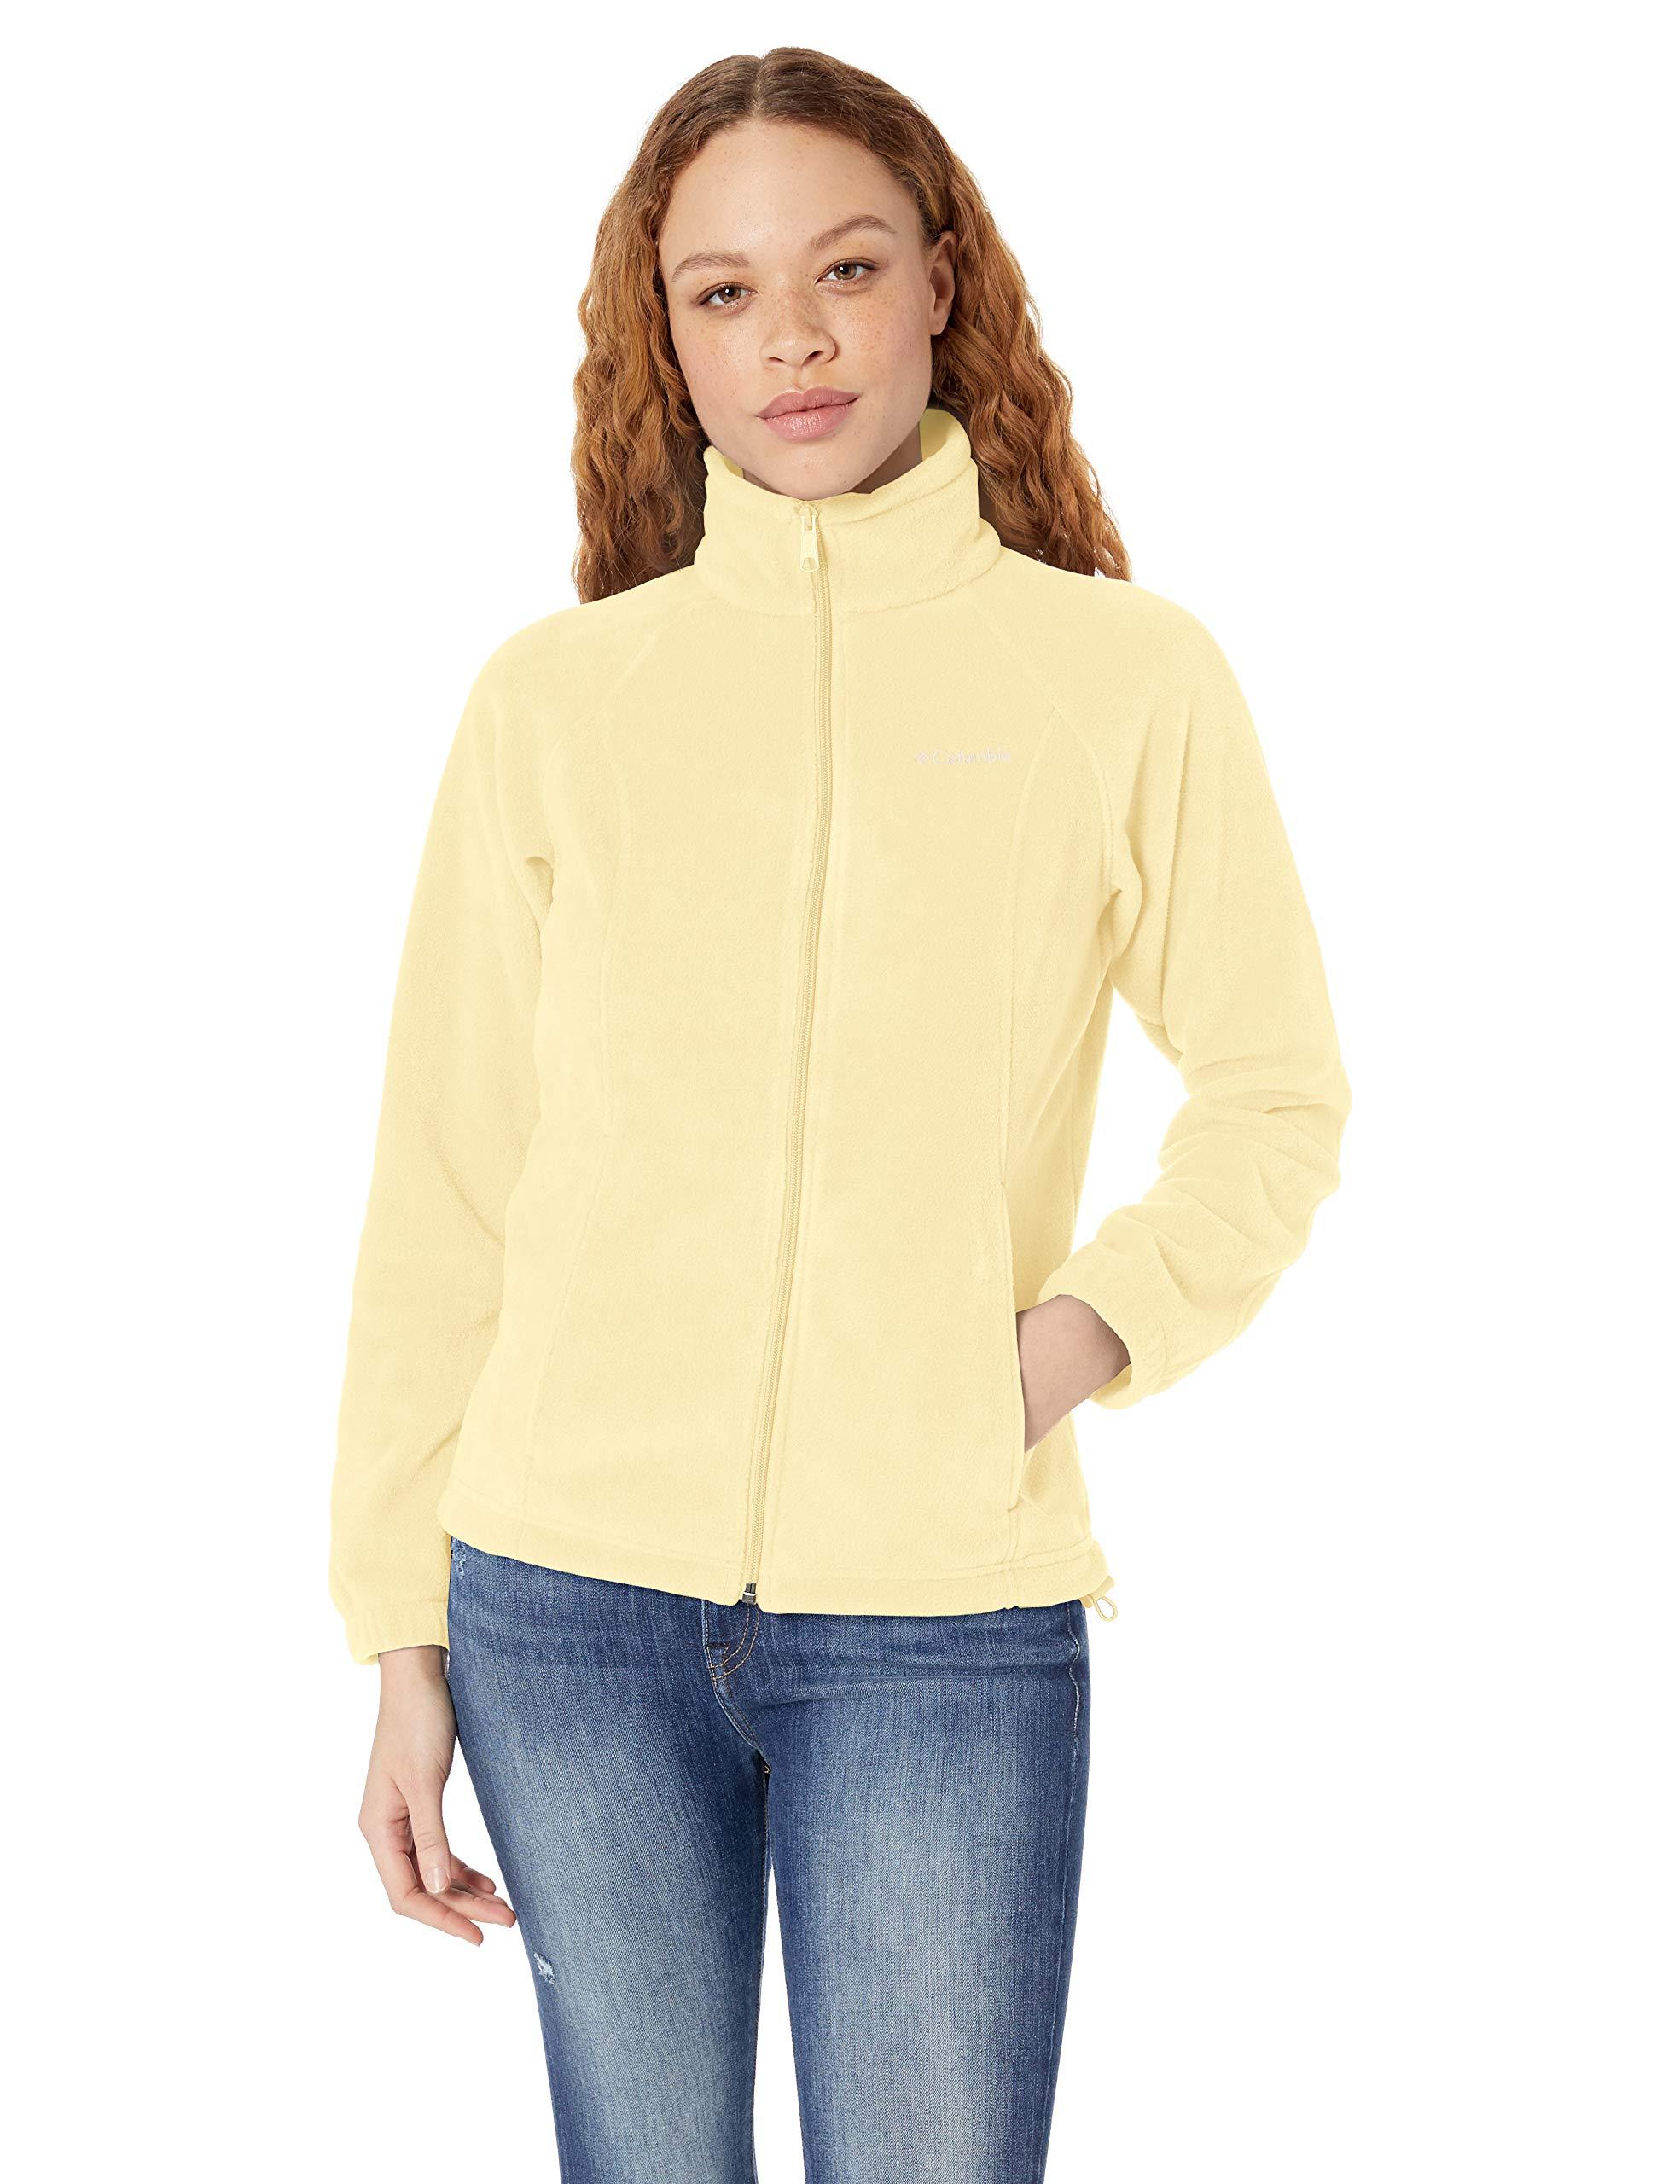 Columbia Women's Plus Size Benton Springs Full Zip Jacket, Endive 1X